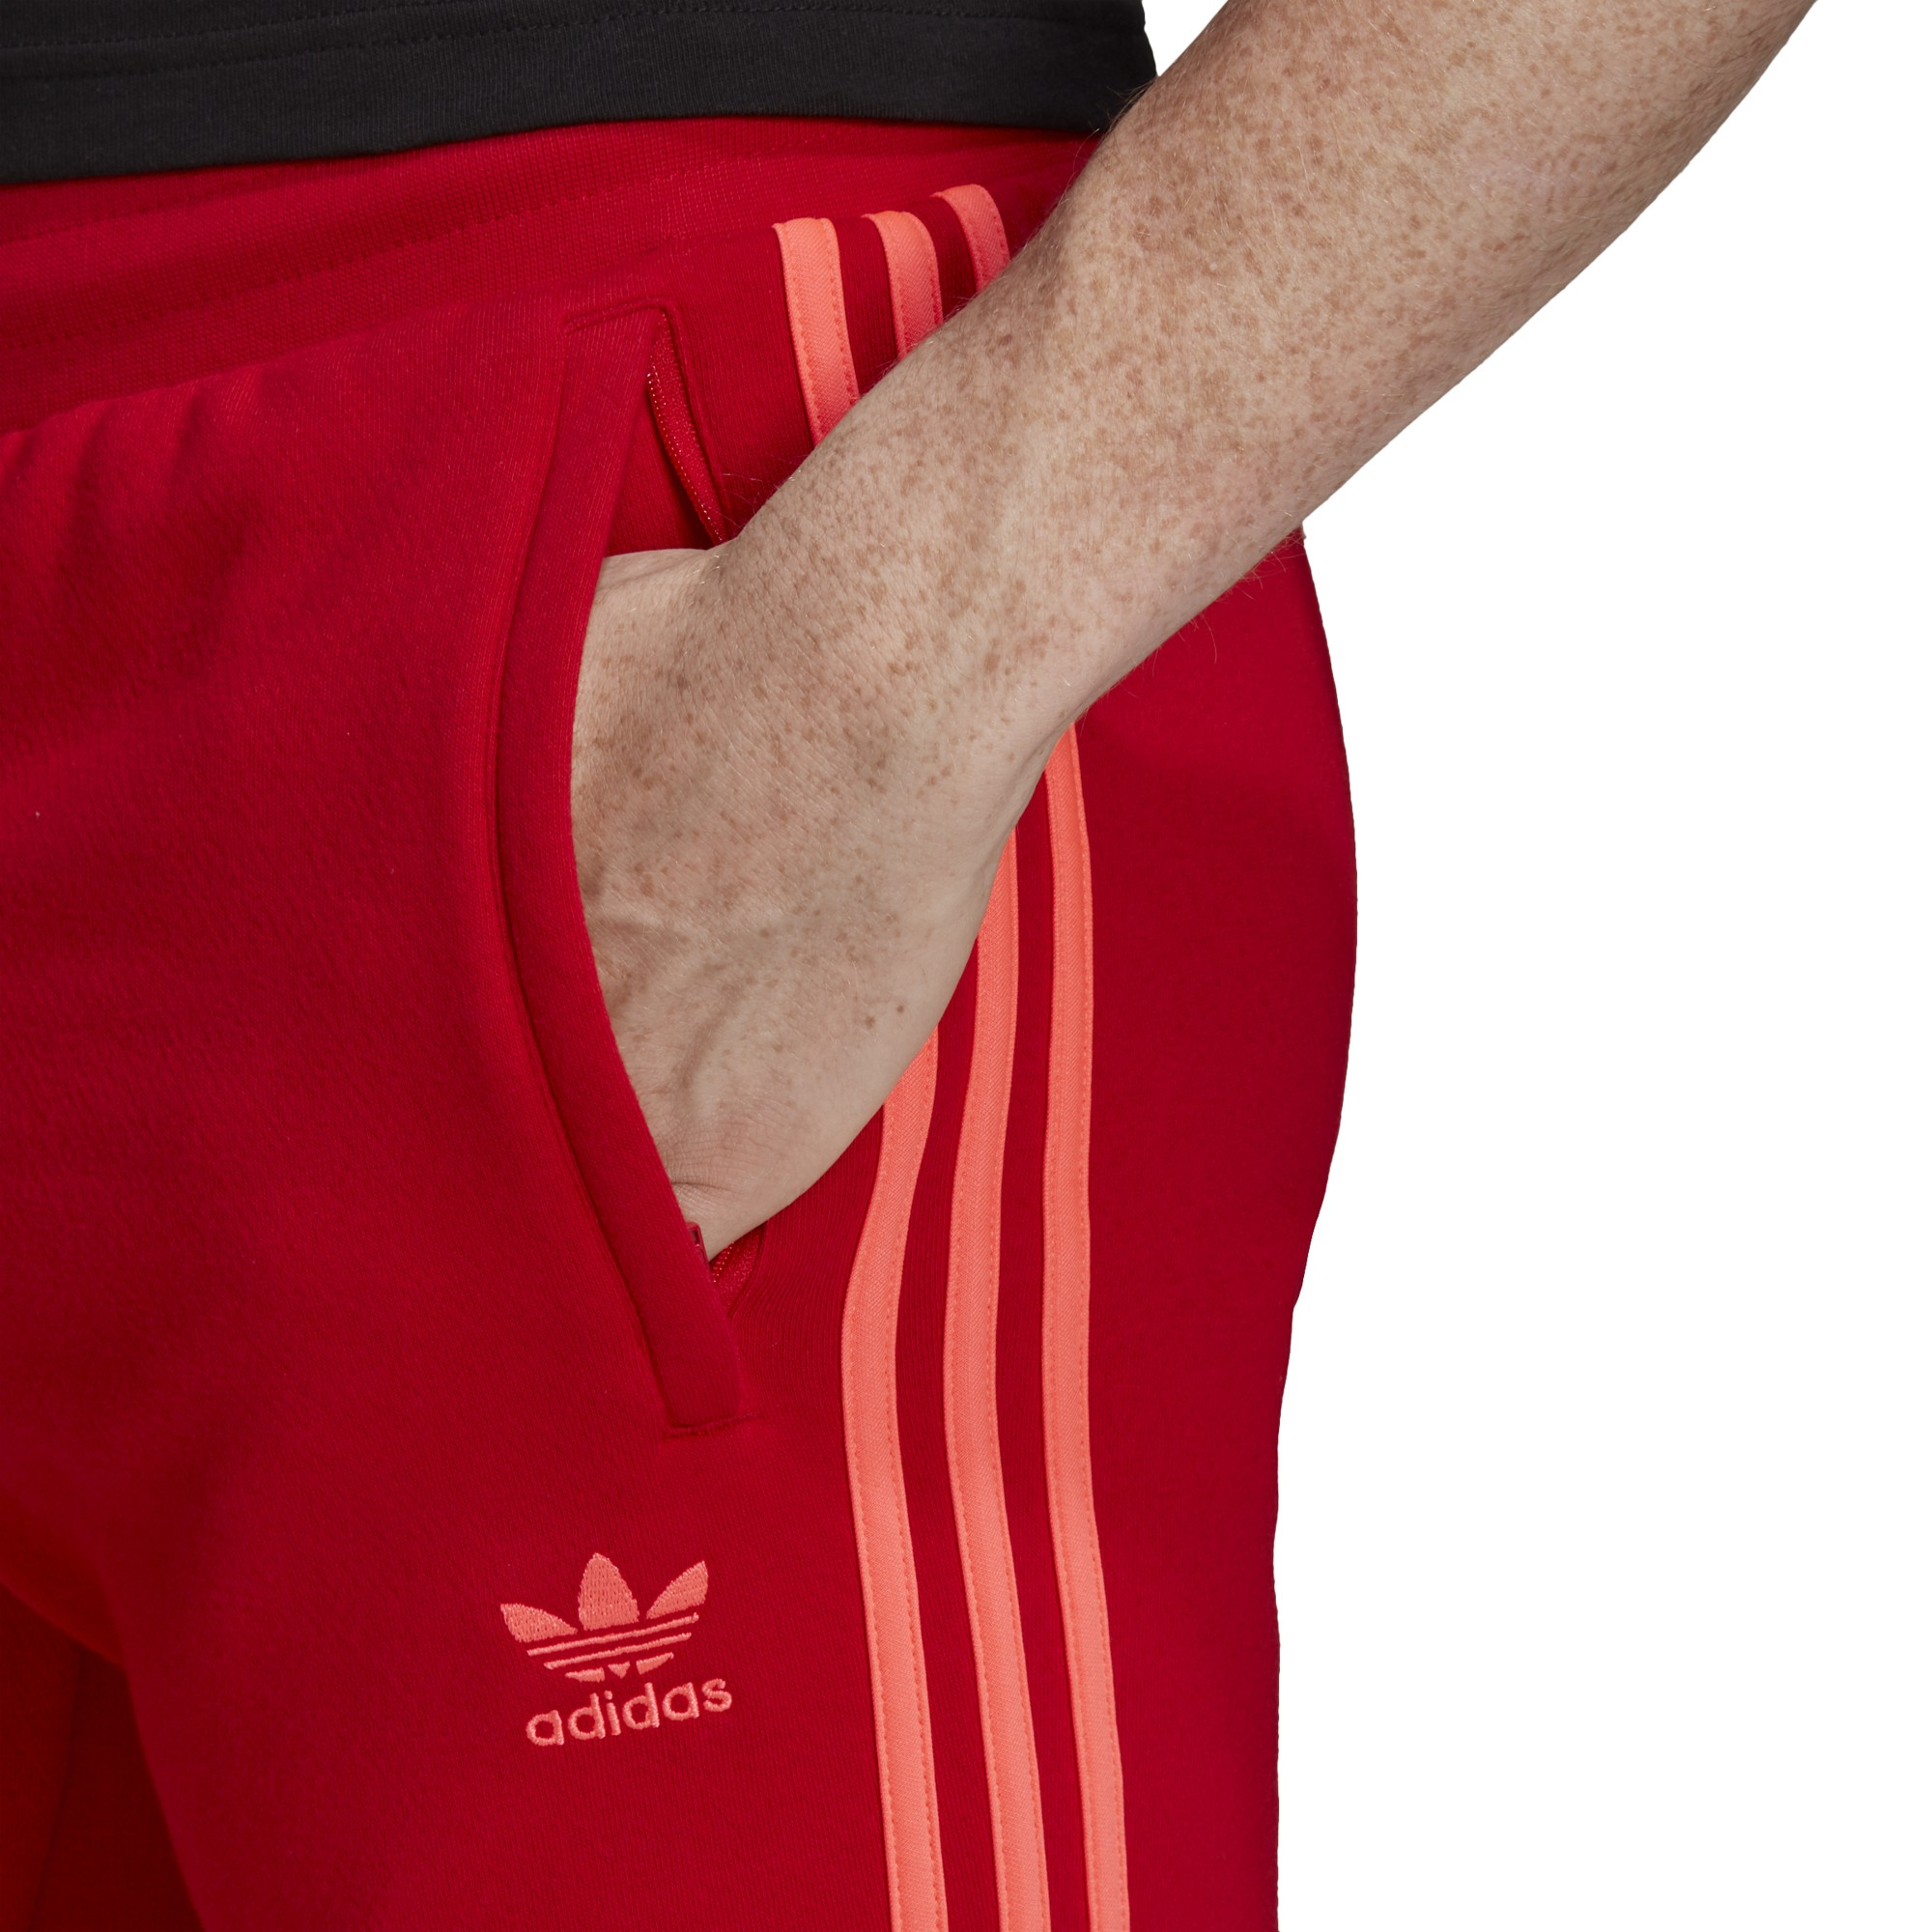 pantaloni adidas uomo bianchi e rossi